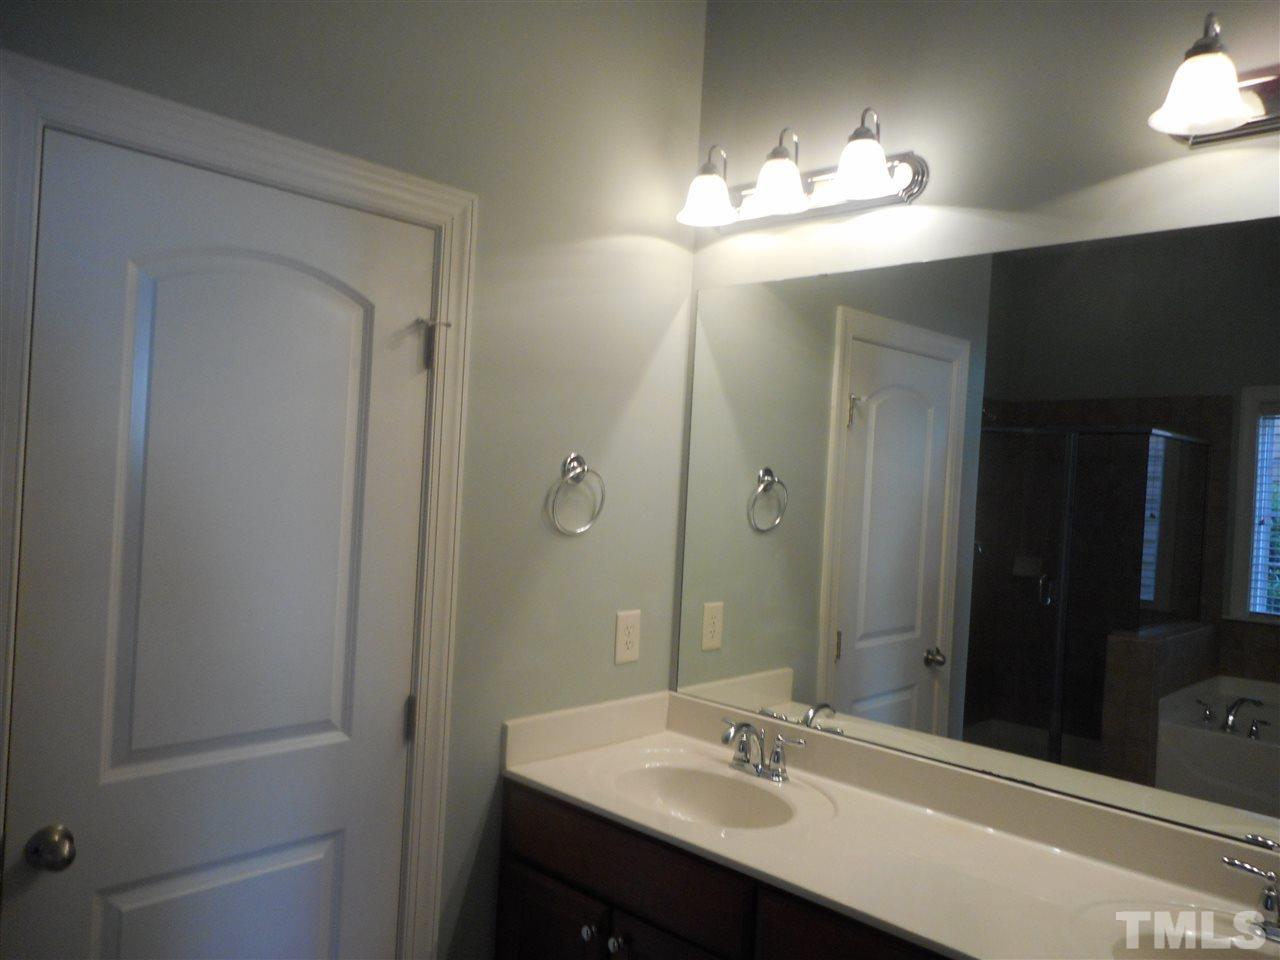 Bathroom Light Fixtures Raleigh Nc 835 historian st, raleigh, nc 27603 mls# 2116145 - movoto